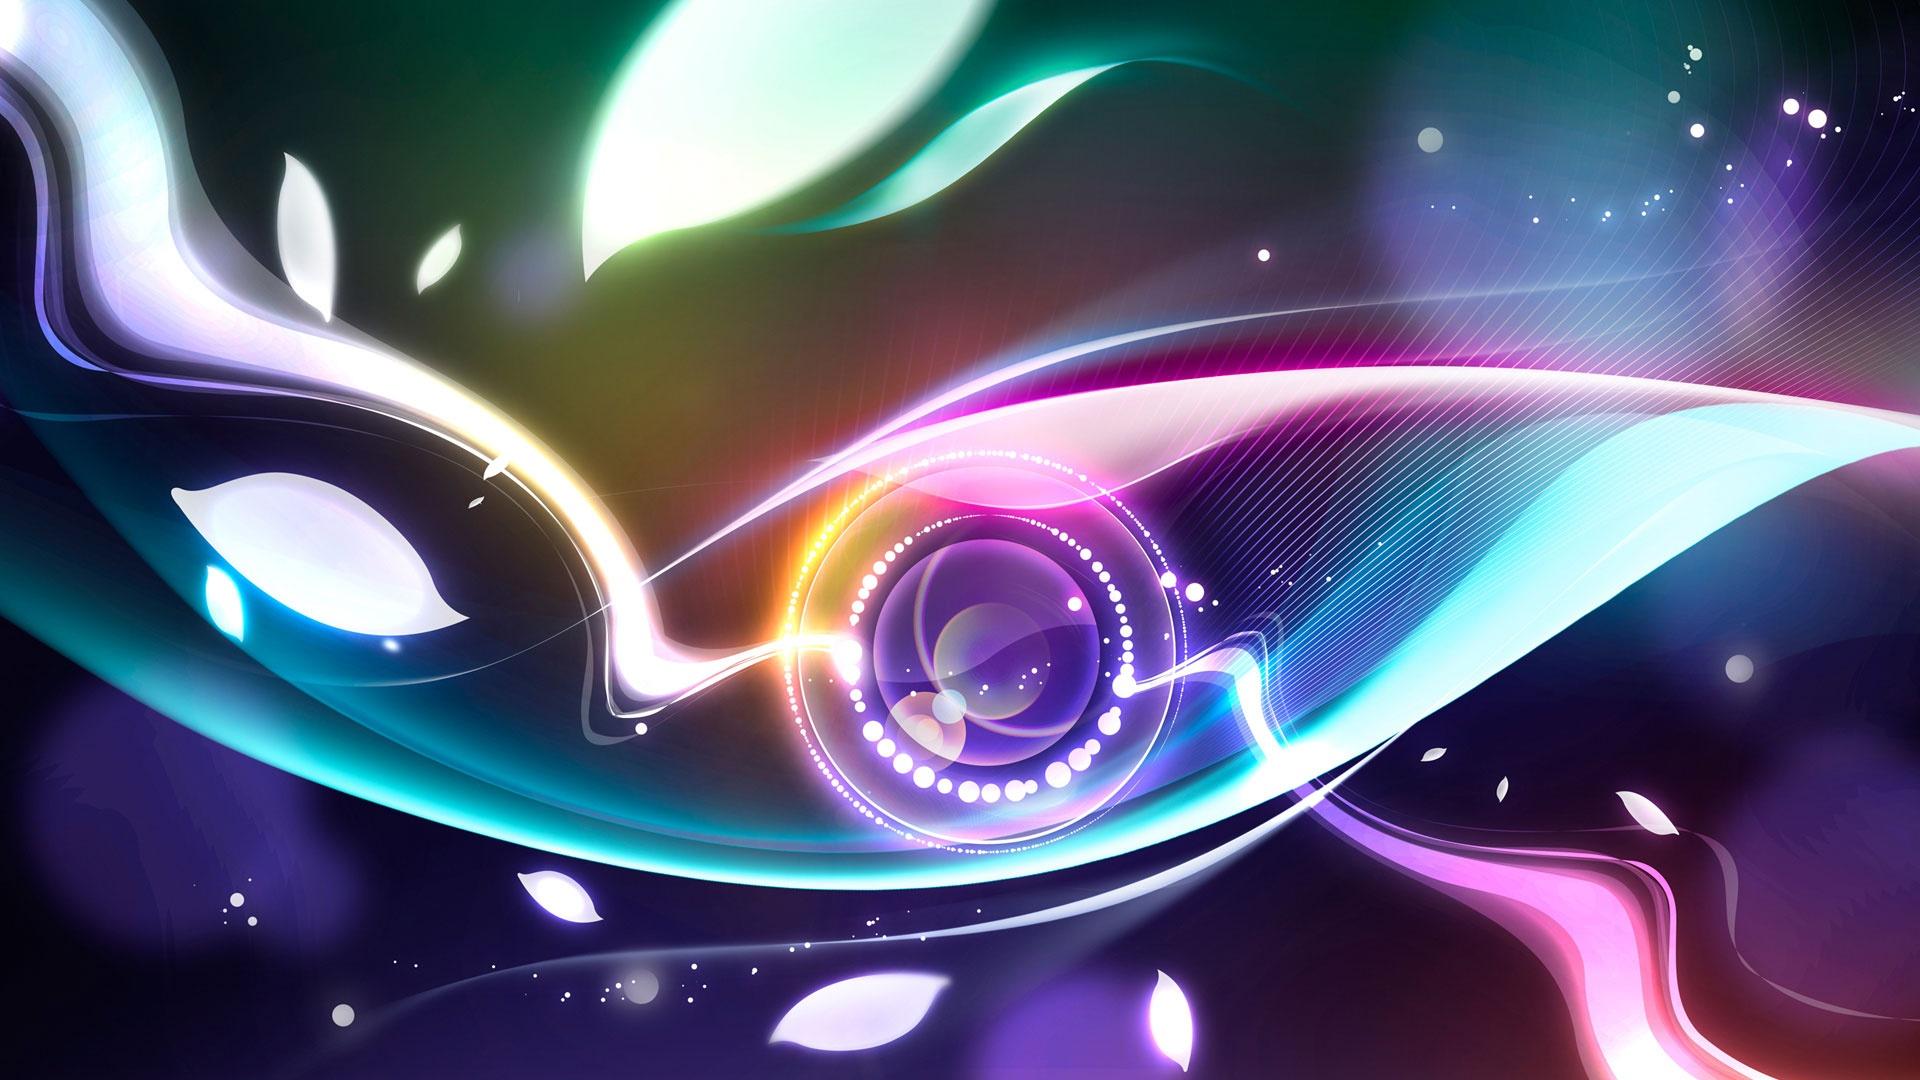 abstract wallpapers hd digital 2